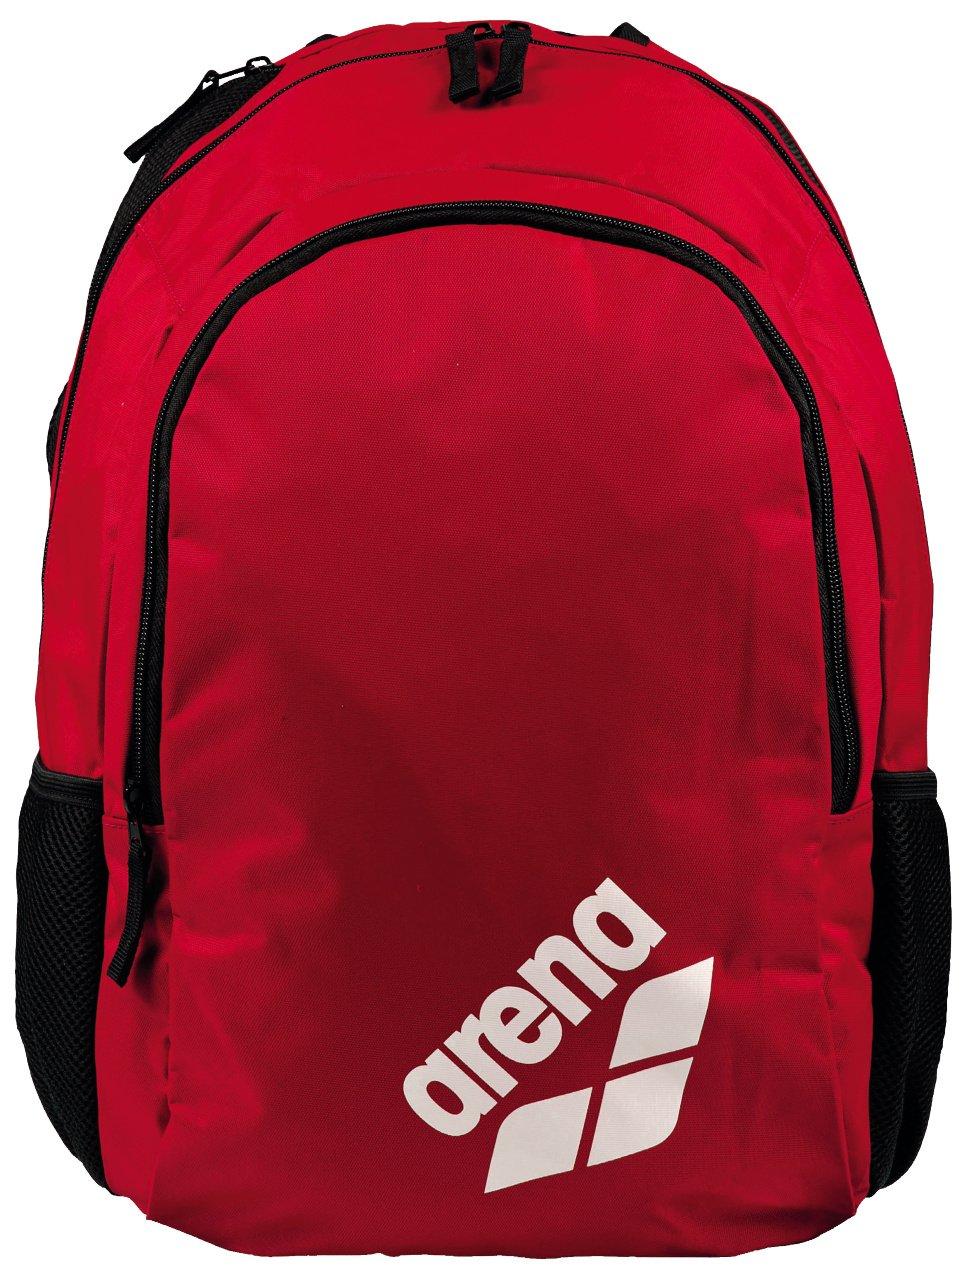 arena Spiky 2 Swim Backpack, Red Team